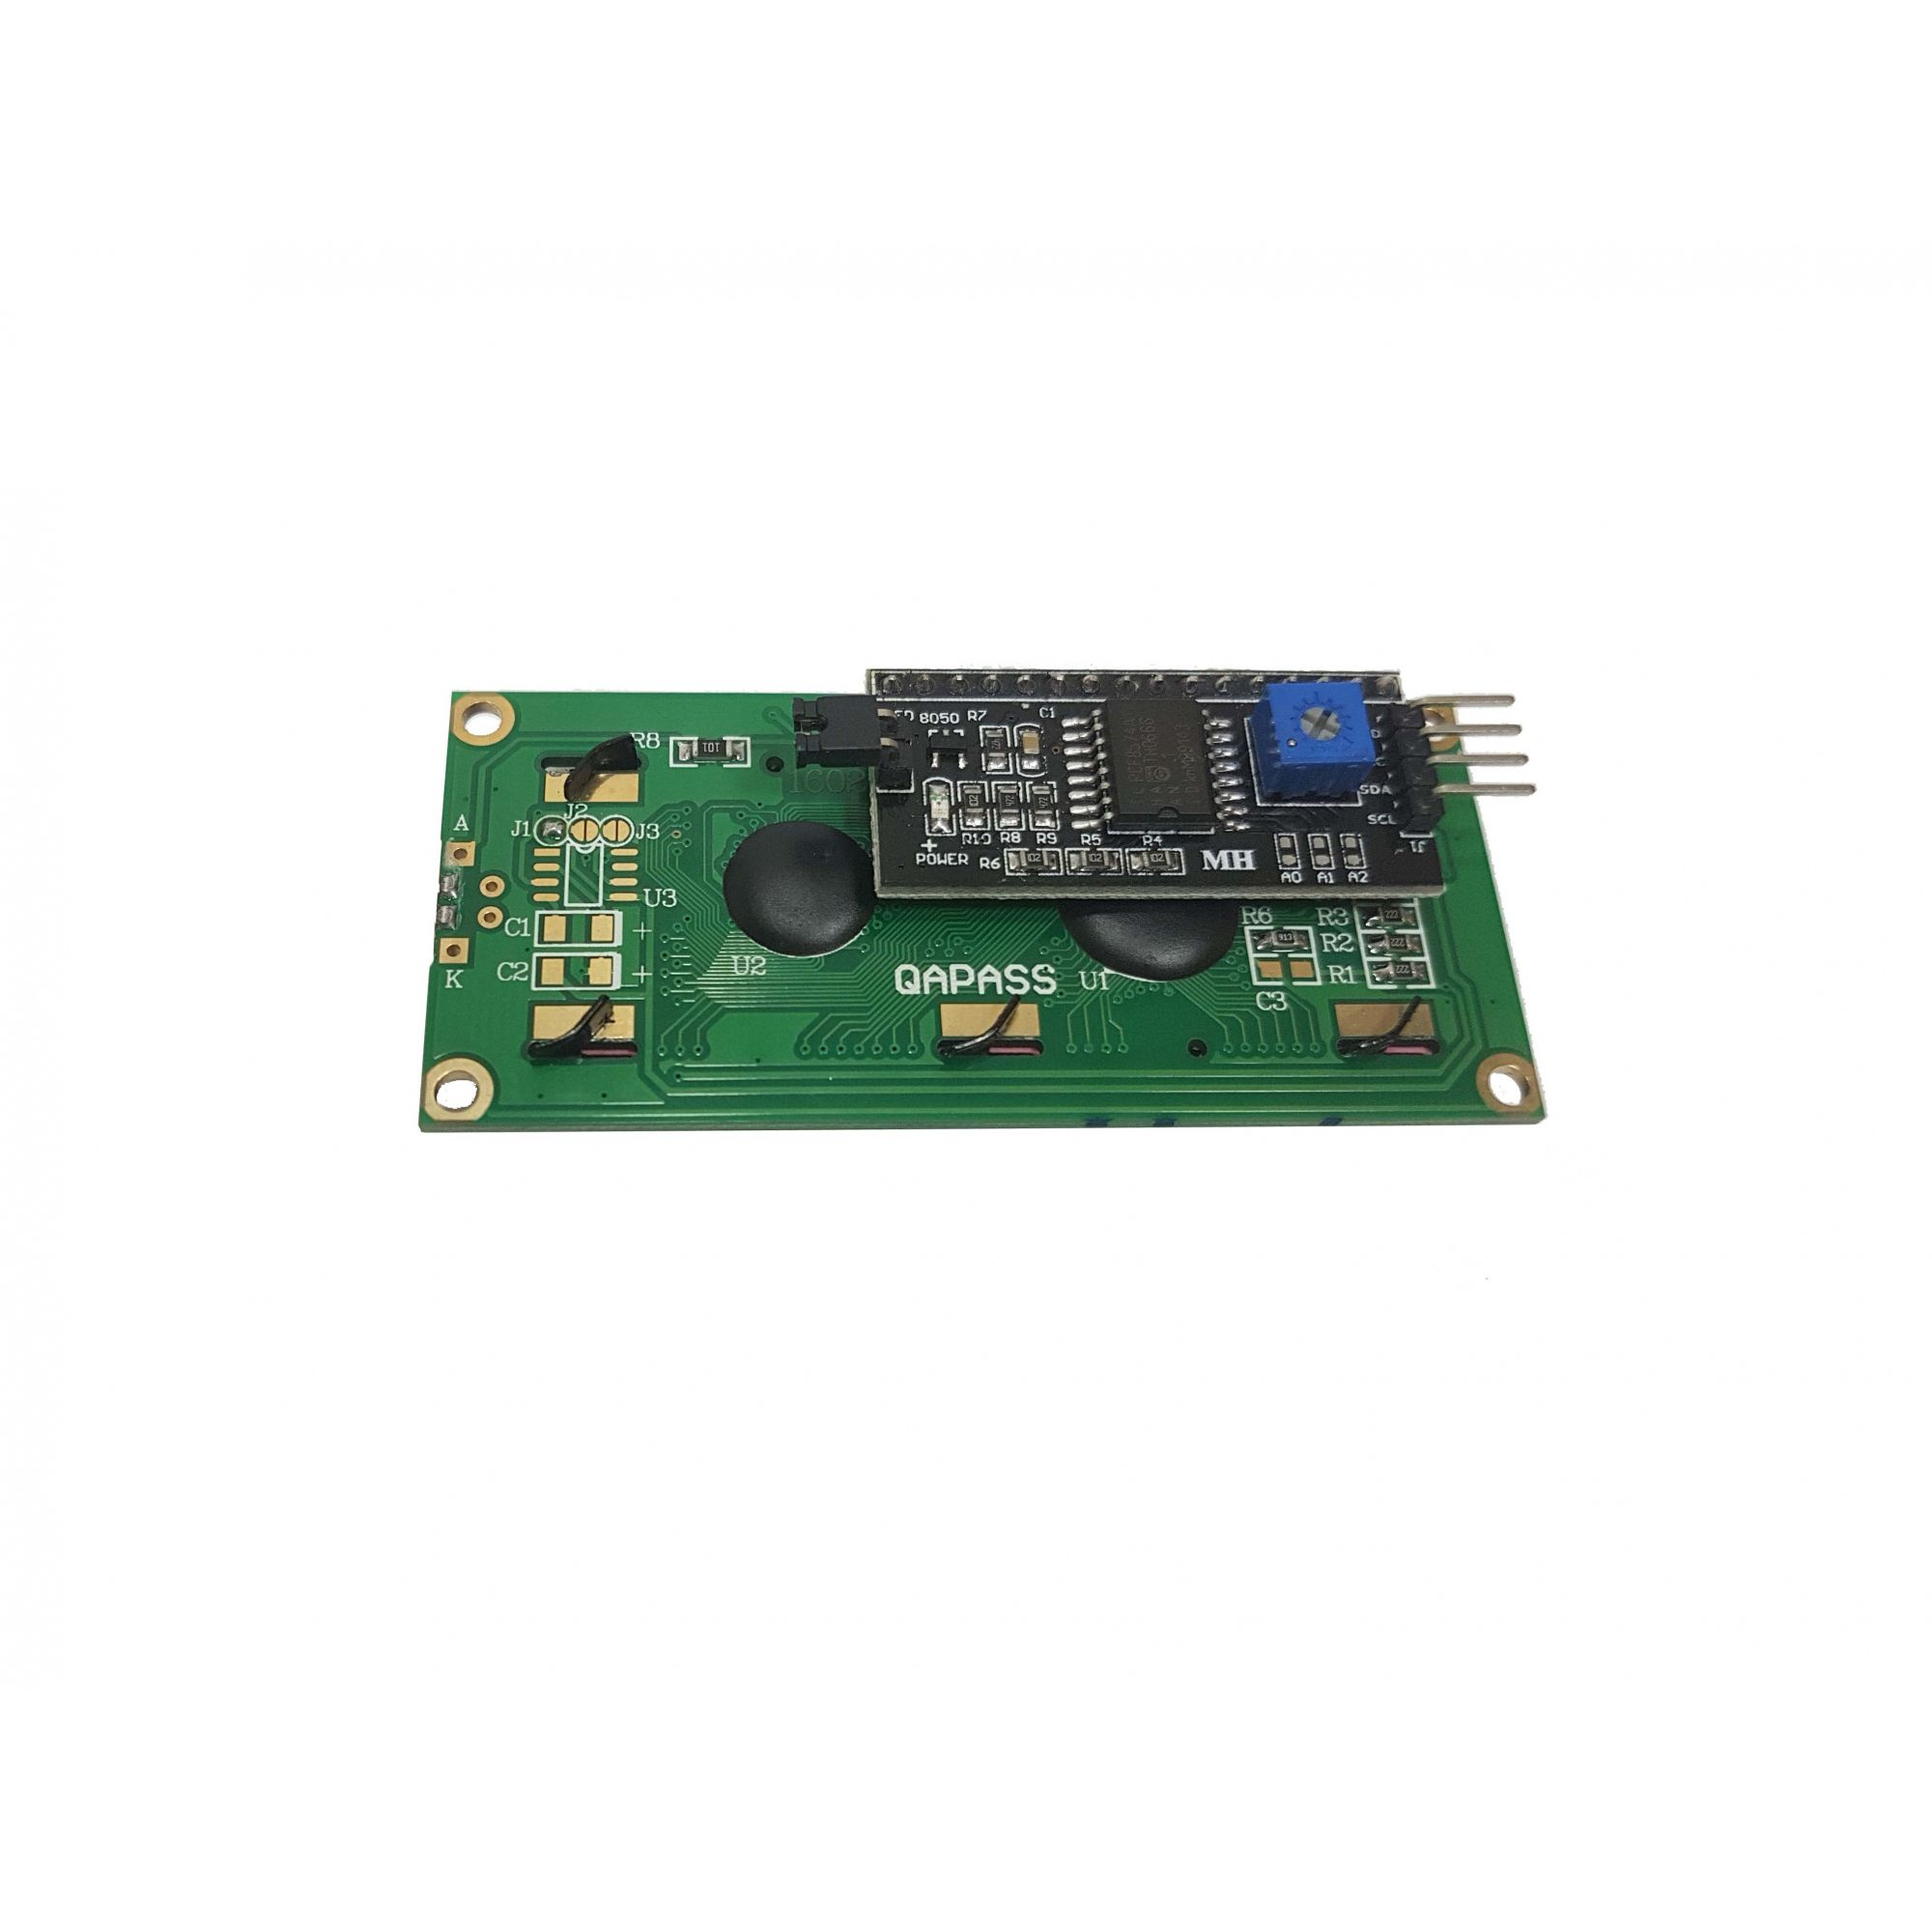 Tela Lcd 16x02 com I2C